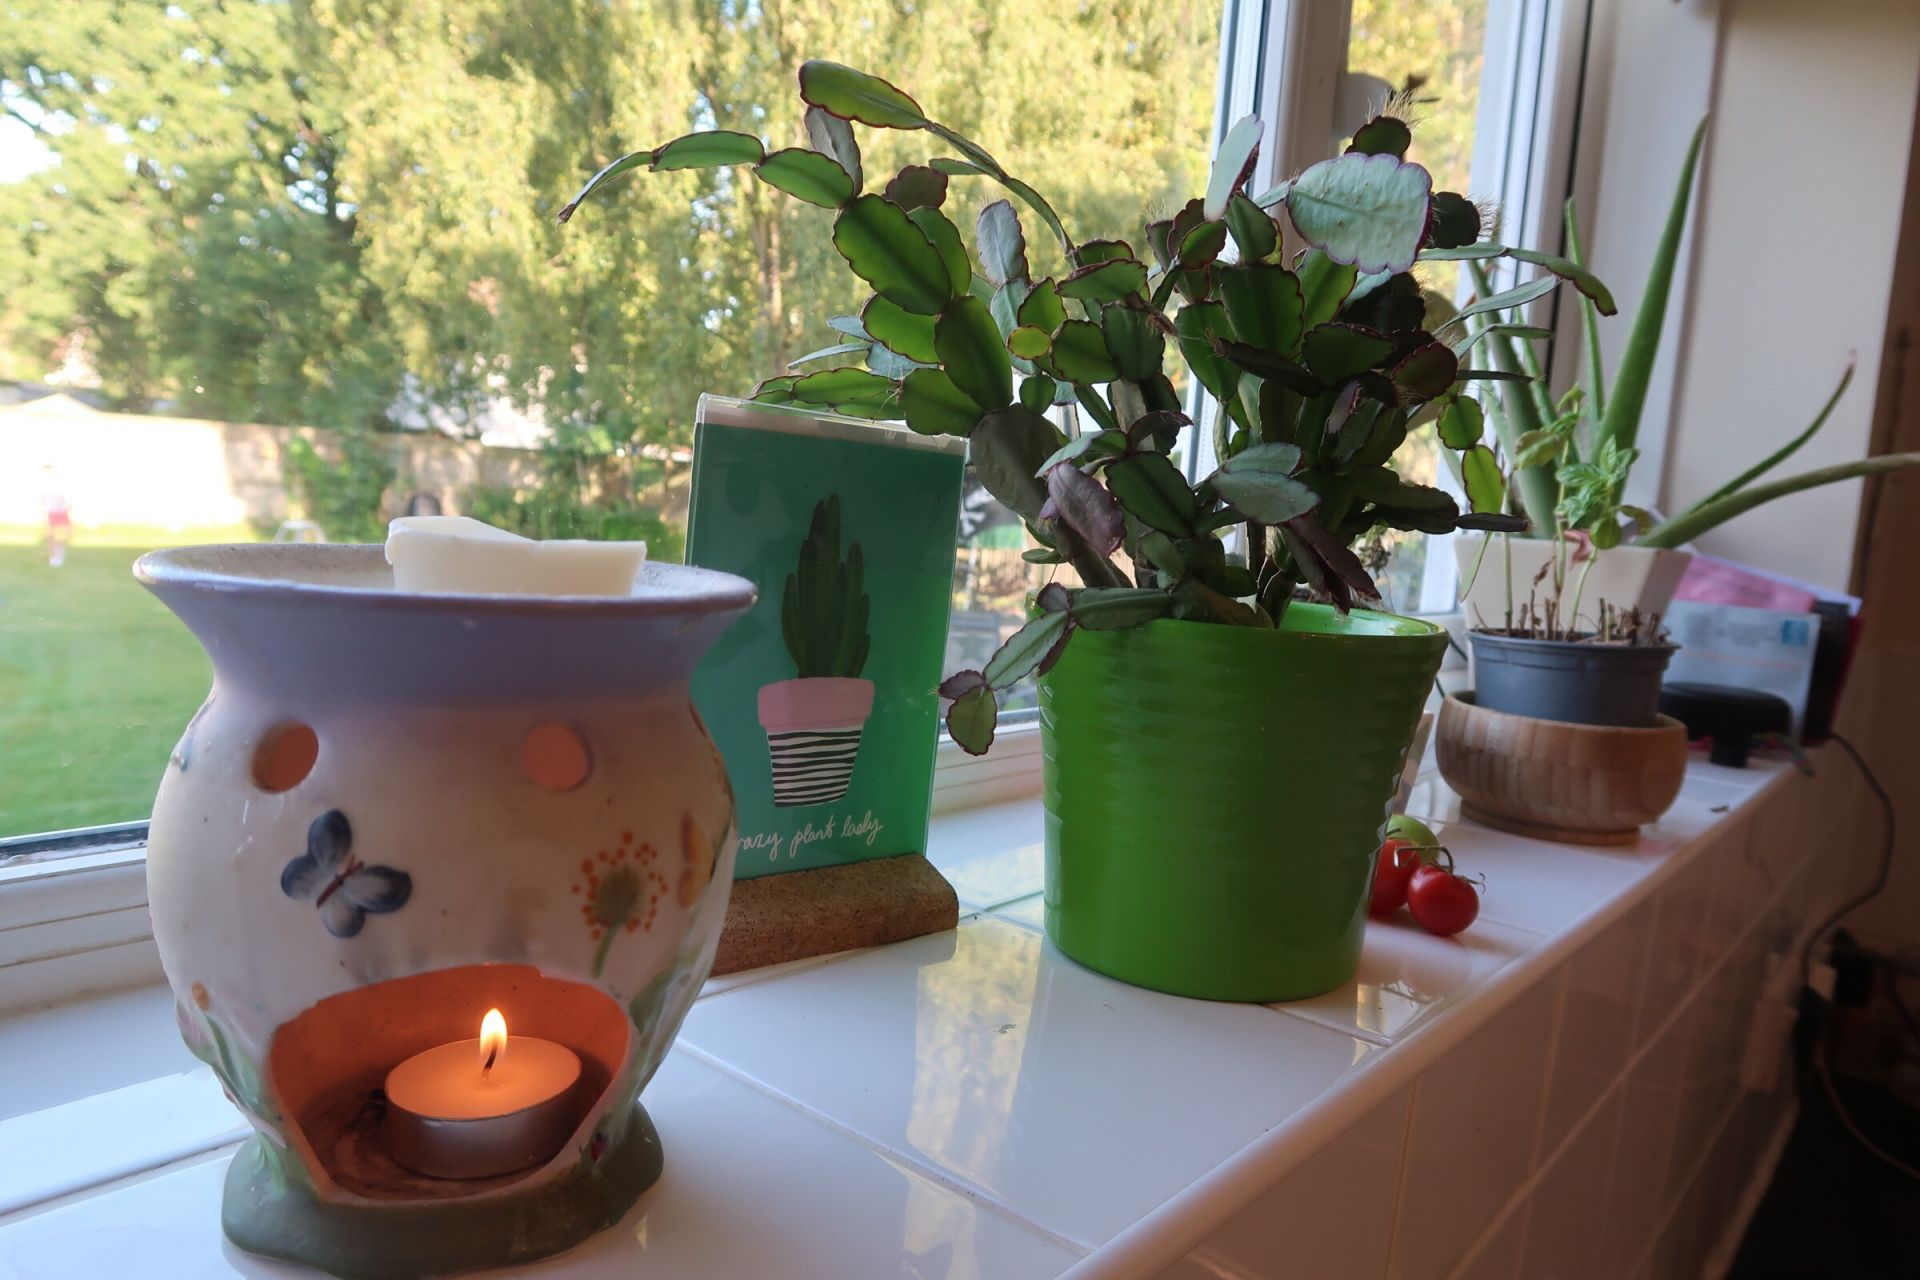 candle burner and plants on a shelf